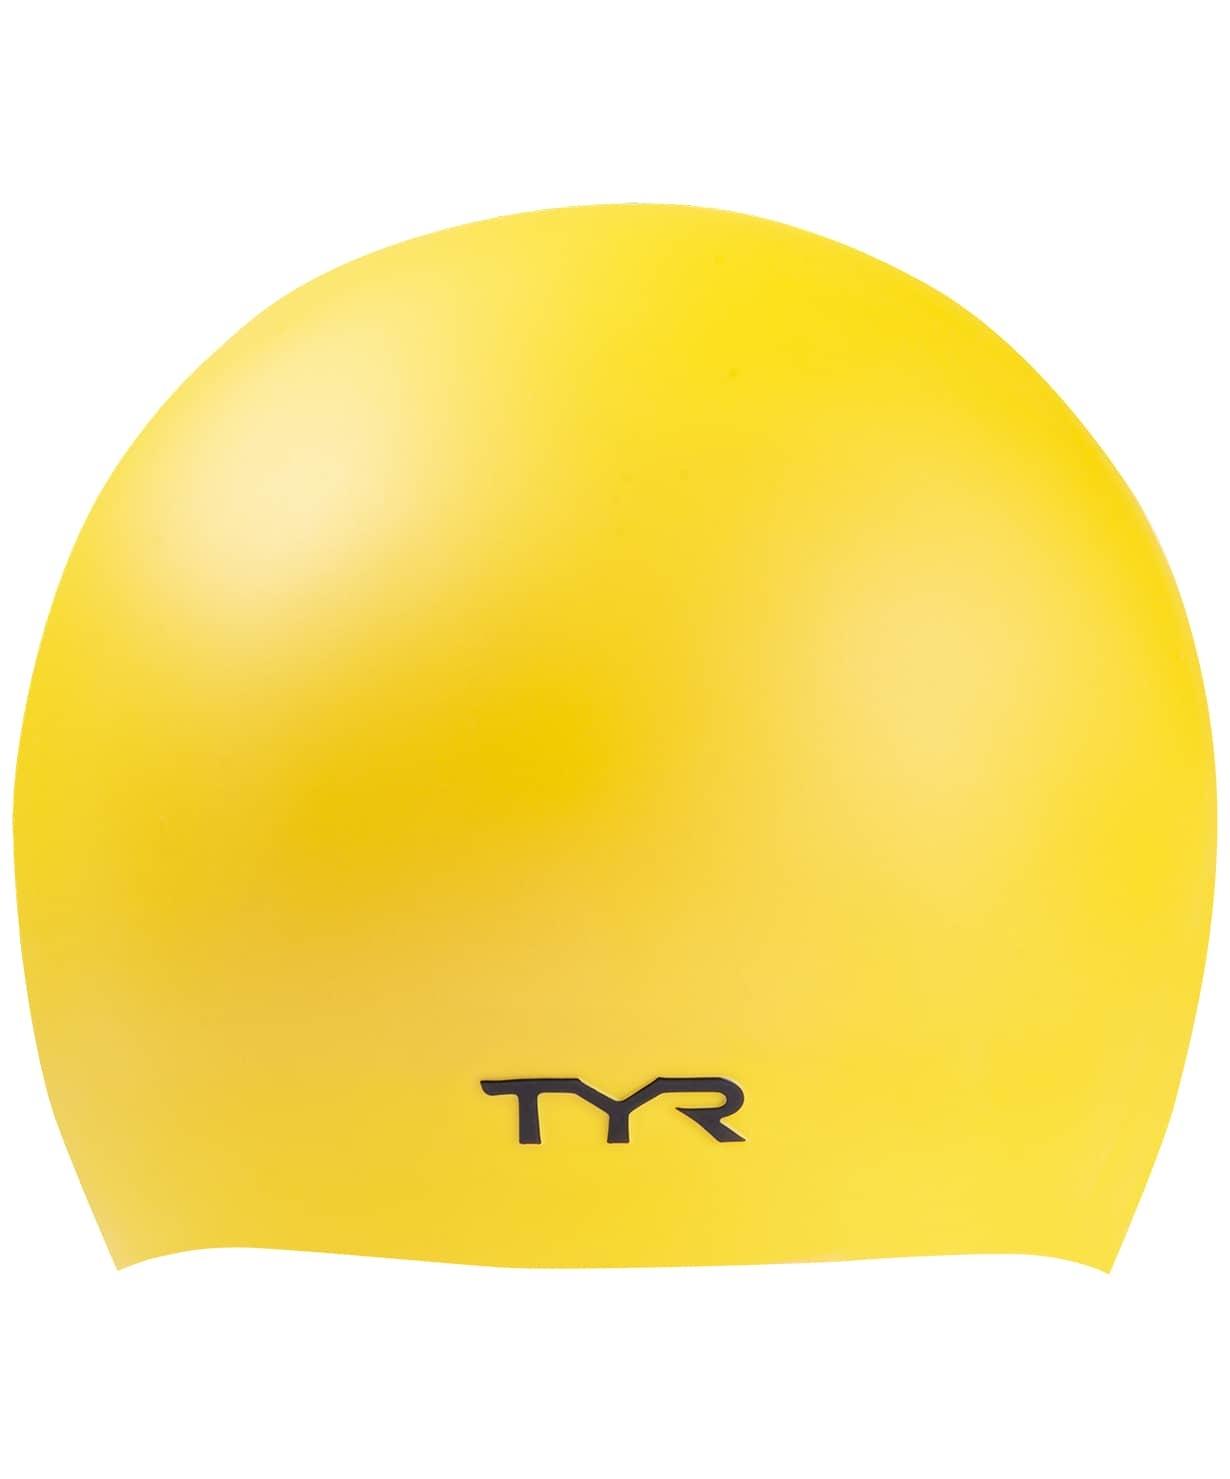 Шапочка для плавания Wrinkle-Free Silicone Cap, силикон, LCSL/720, желтый